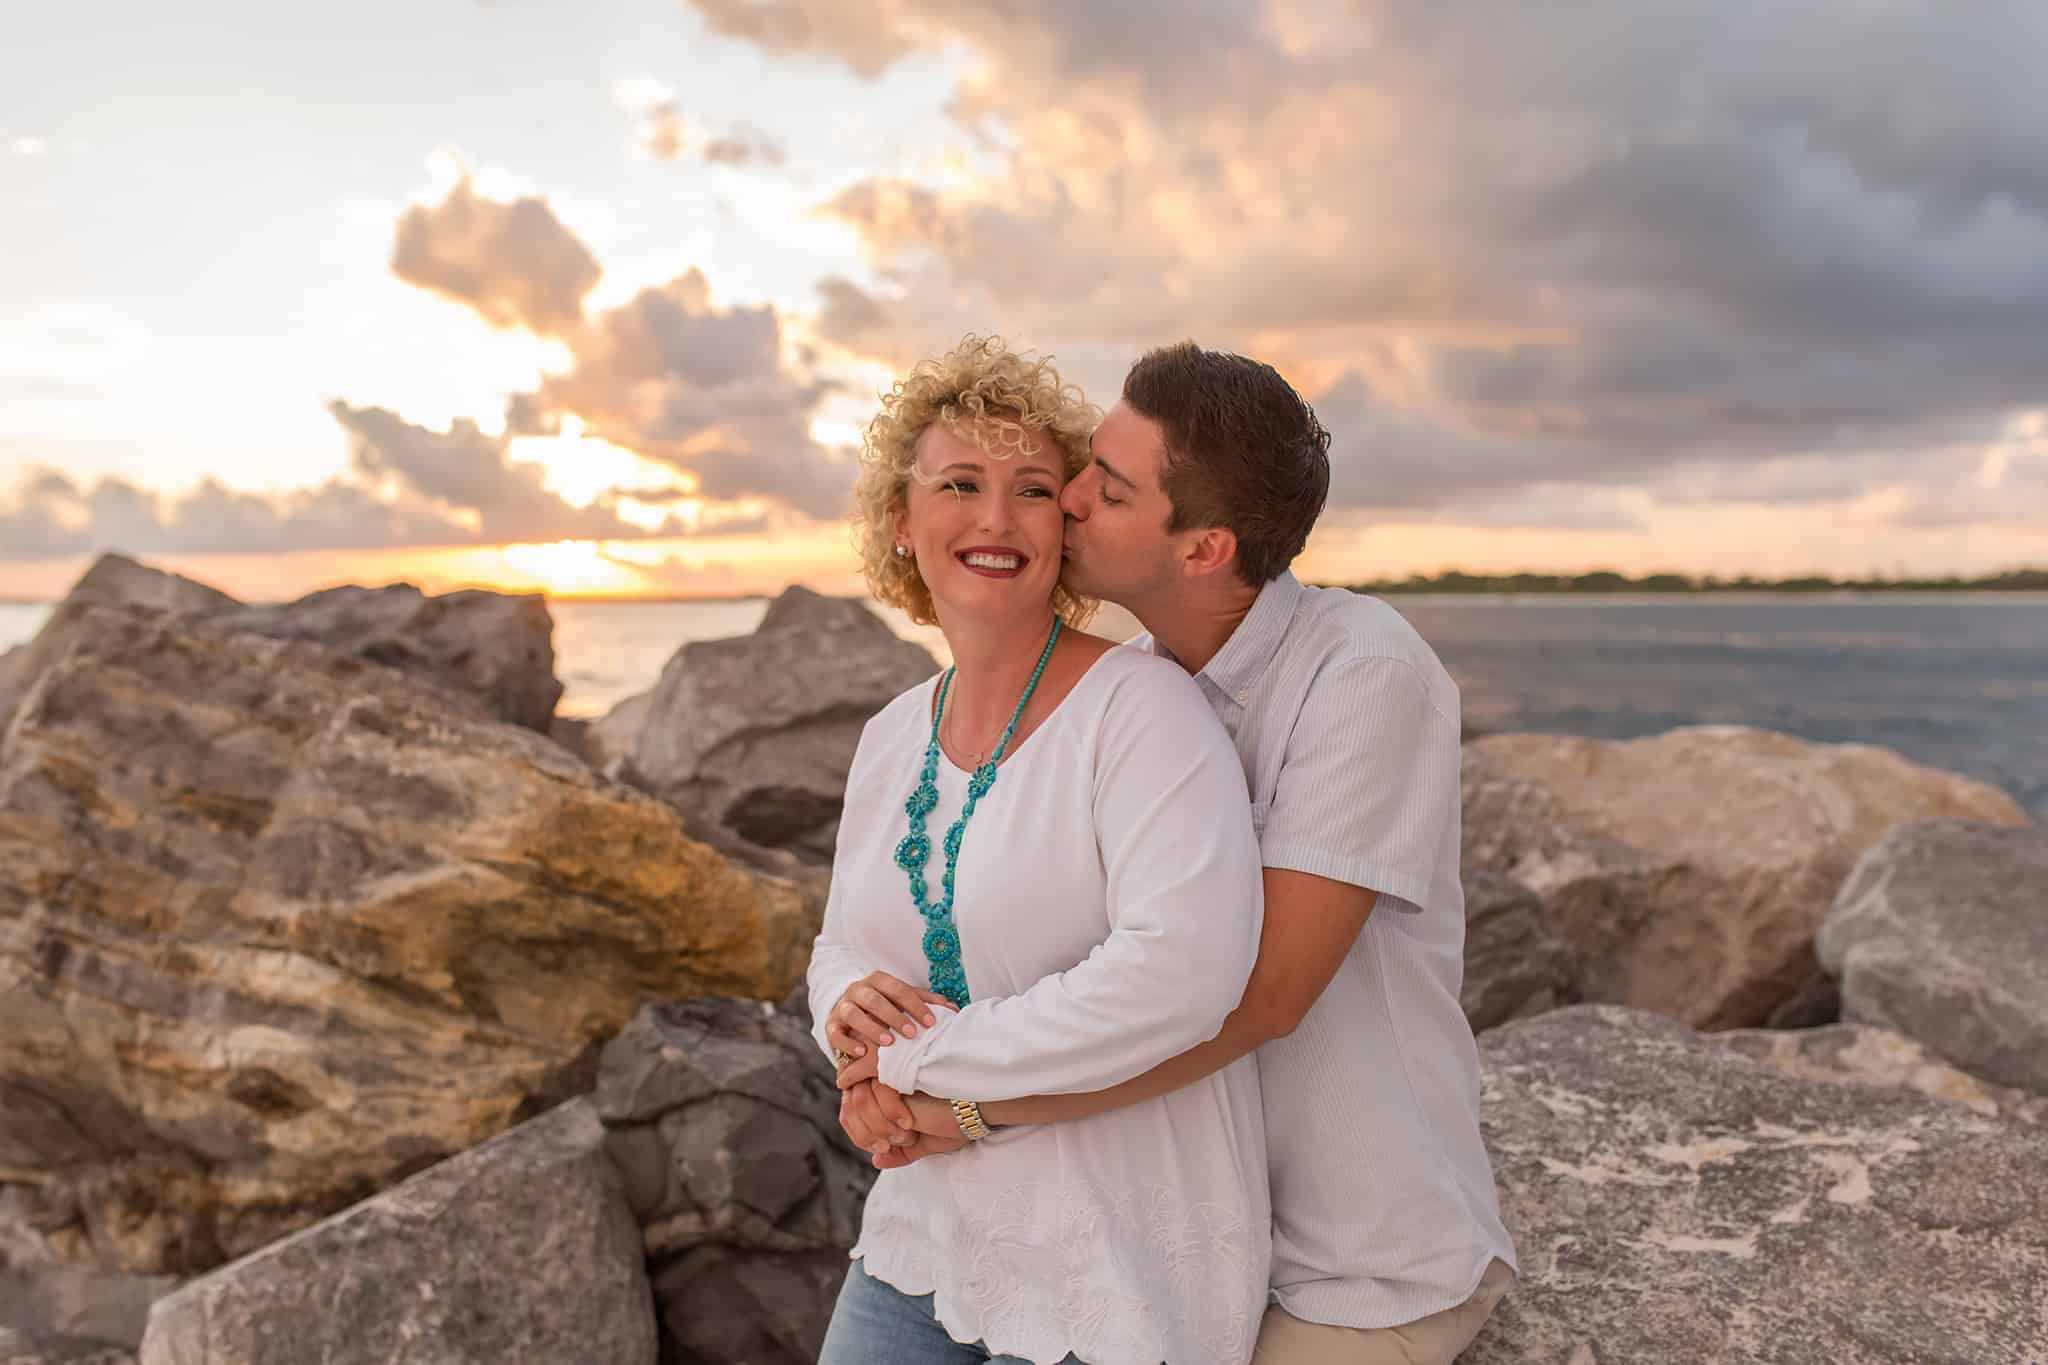 30A Sunrise Family Photography - LJennings Photography